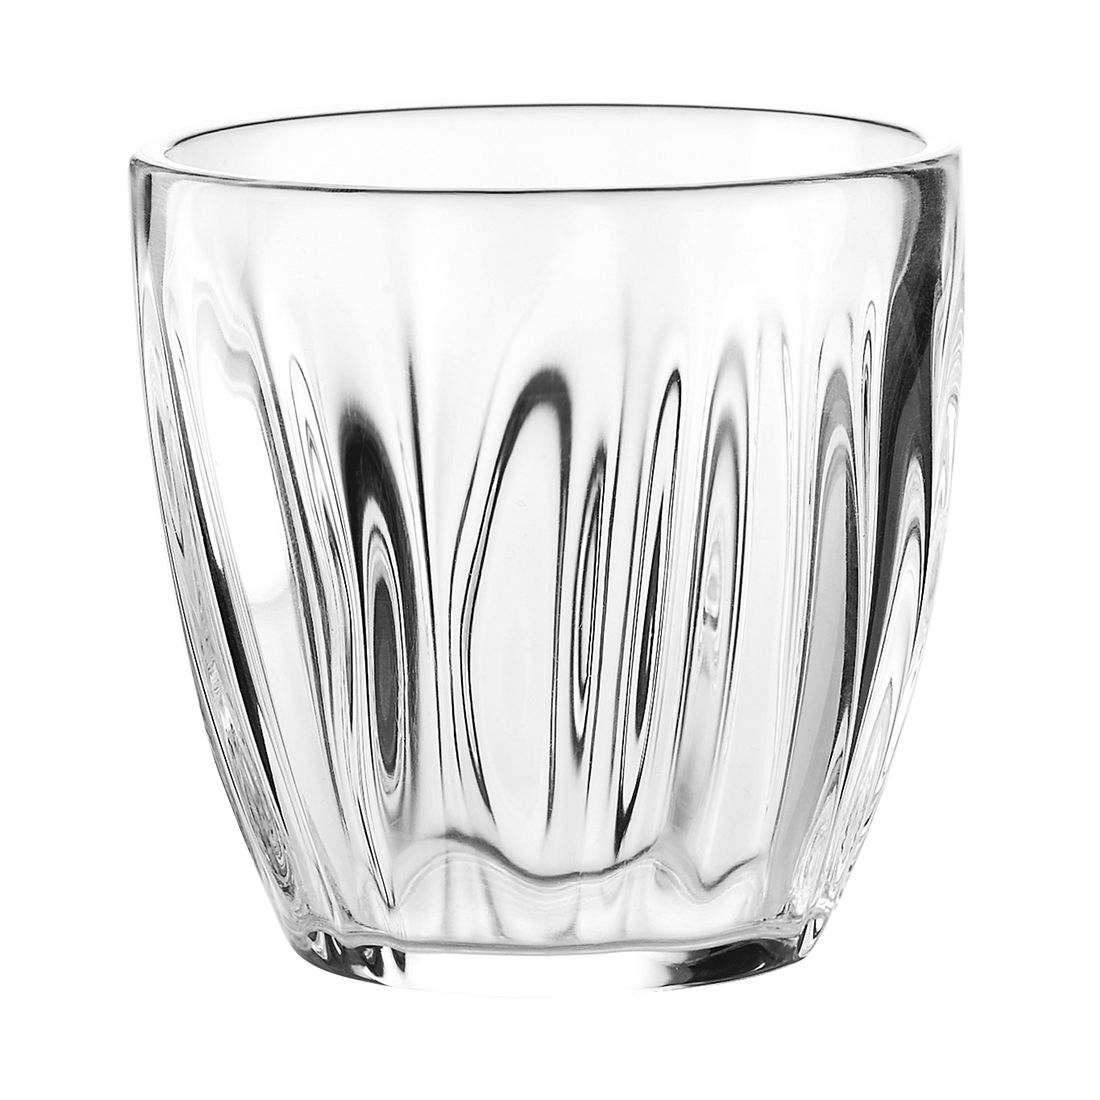 Wasserglas Aqua – Kunststoff Transparent, Guzzini günstig online kaufen